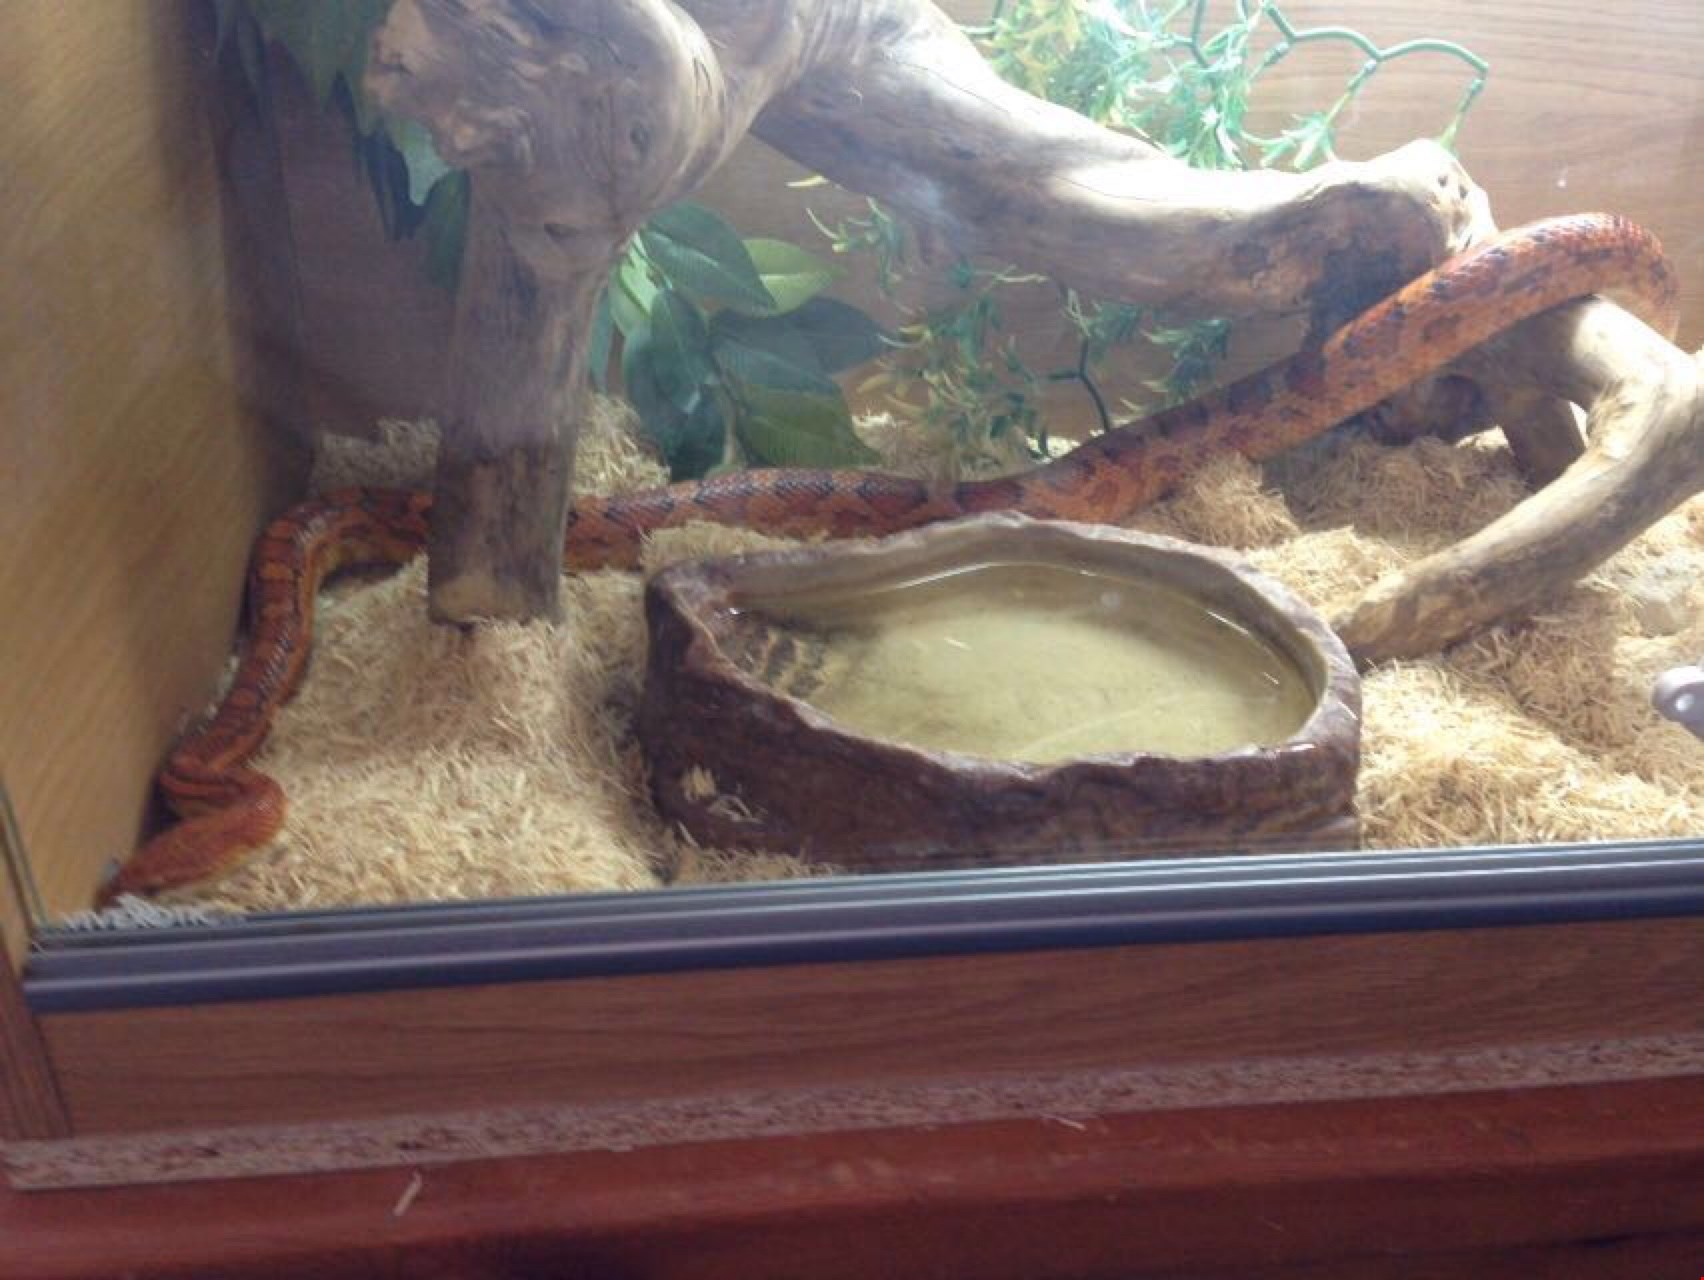 Corn snake belonging to HomeServe employee